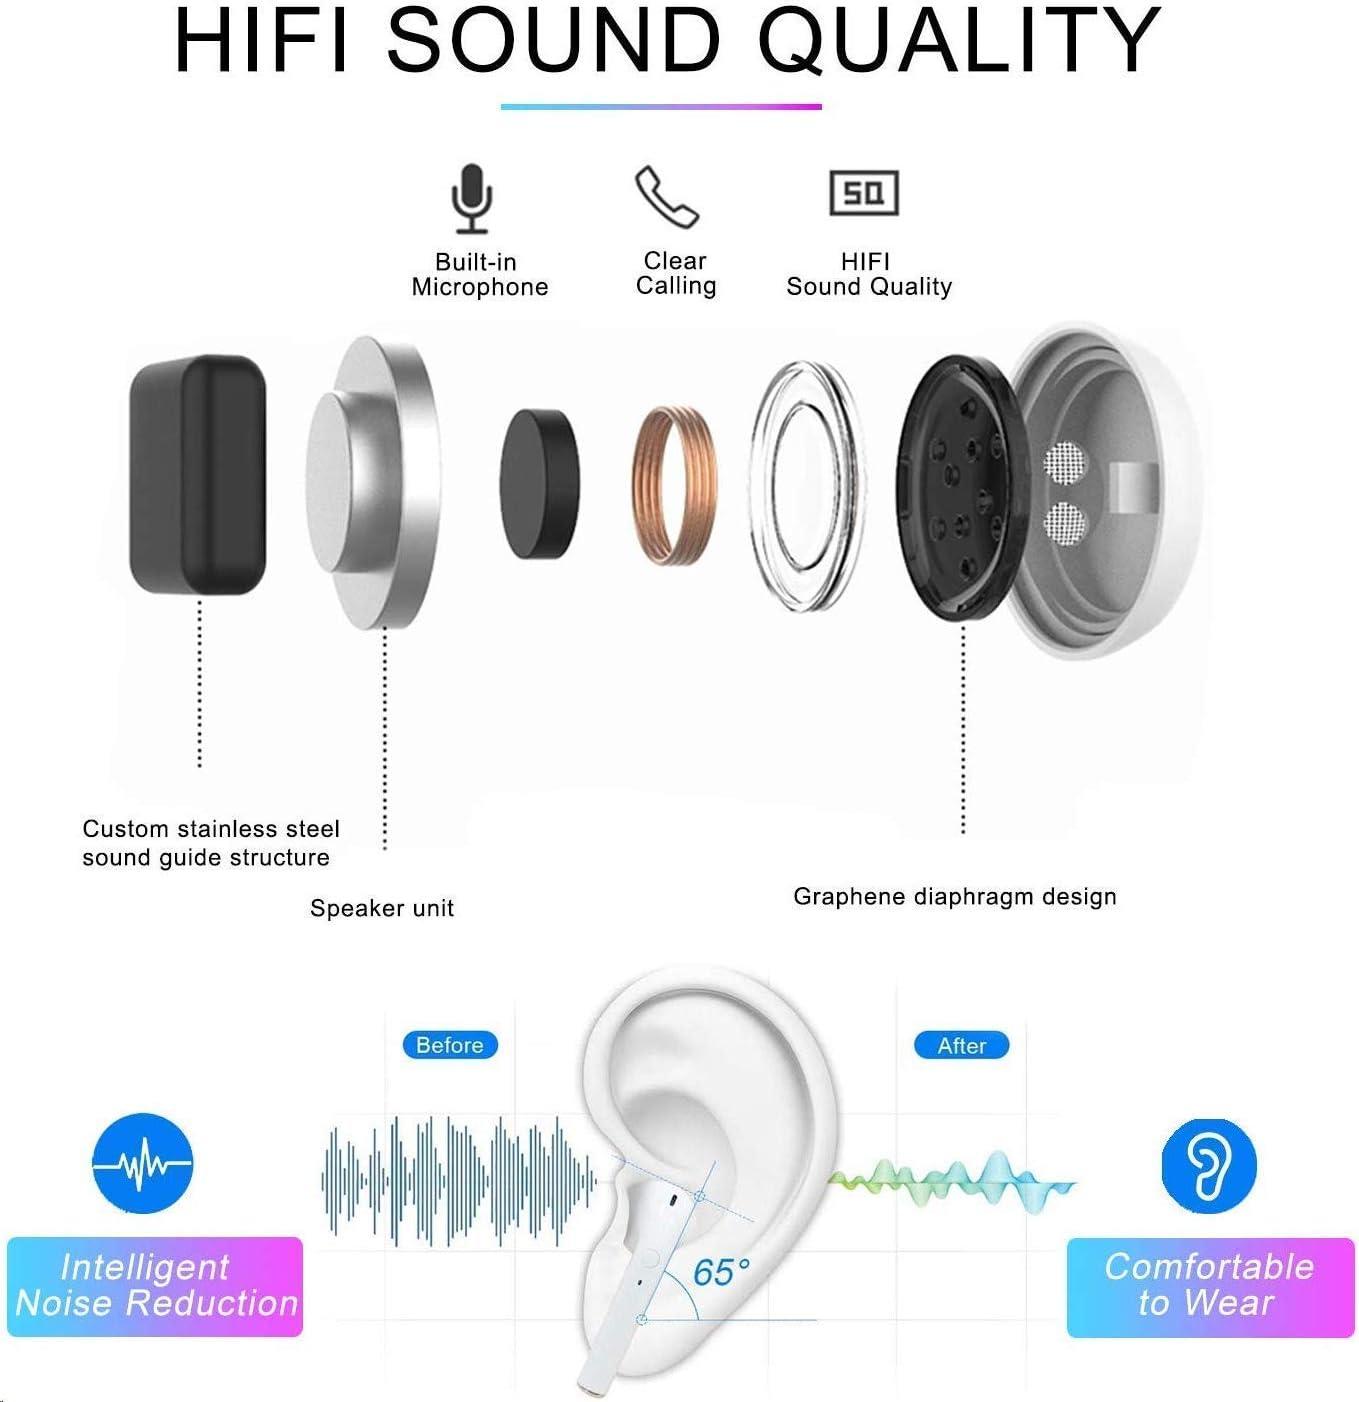 Kopfh/örer in Ear HD Stereo Sound Bluetooth 5.0 Ohrh/öre Wireless Earbuds mit Mikrofon,Touch-Control,und Tragbare Ladeh/ülle f/ür IOS Airpods Android Samsung Huawei HTC Bluetooth Kopfh/örer